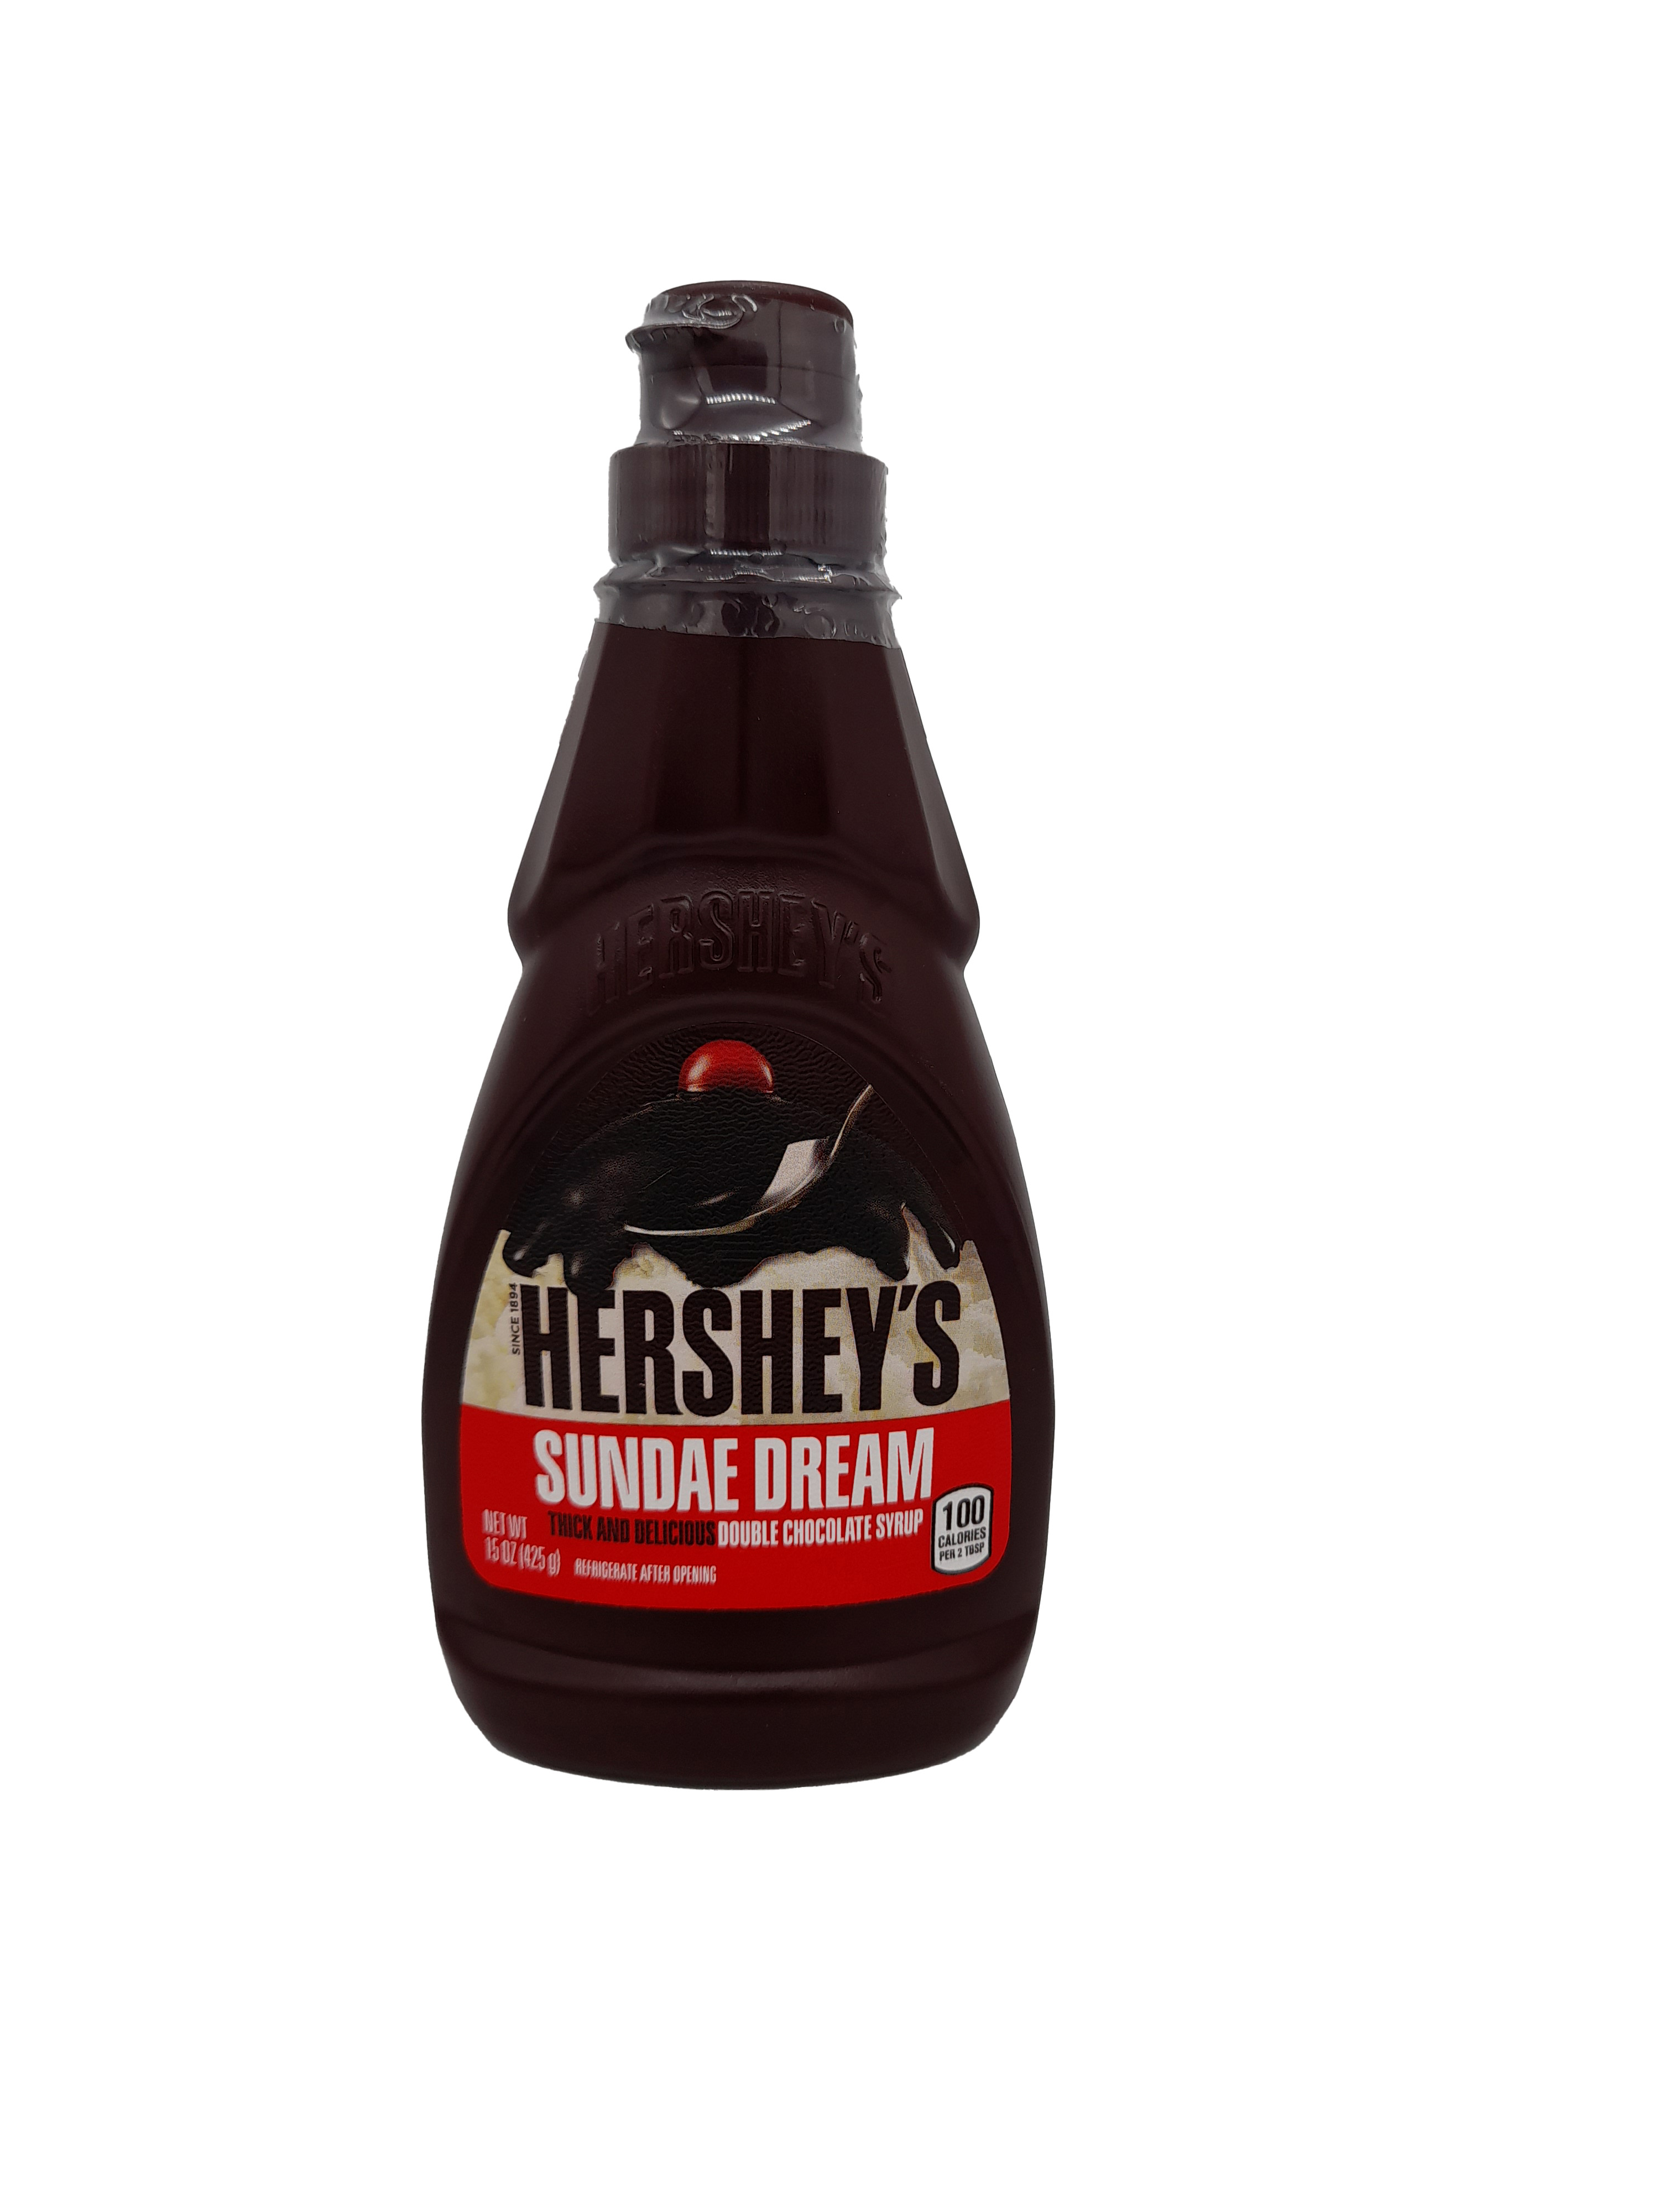 Hershey's Sundae Dream Double Chocolate Syrup 425g